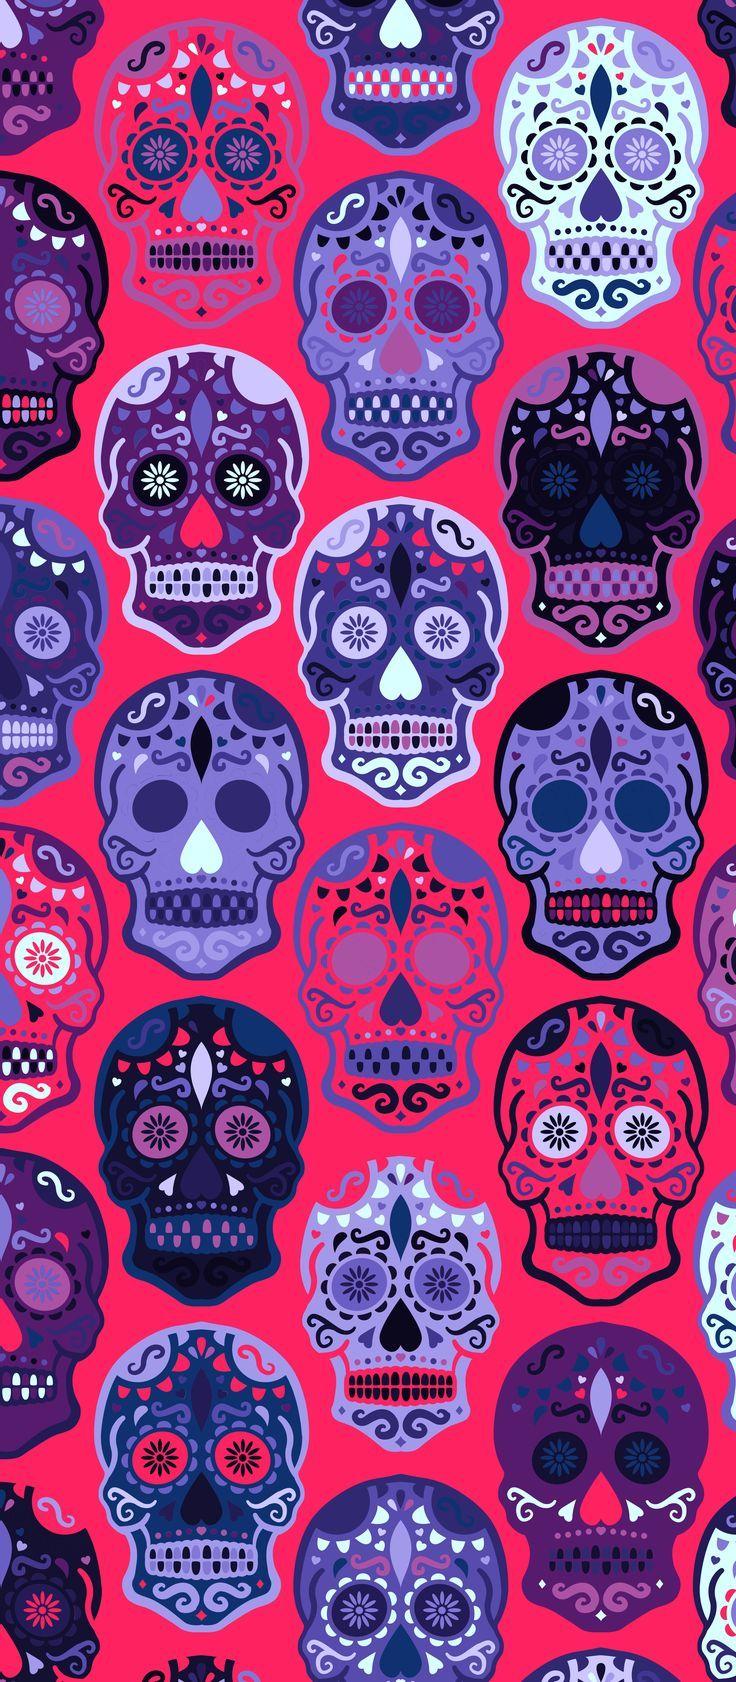 Skull iPhone X Wallpaper 297096906665133994   Patterns